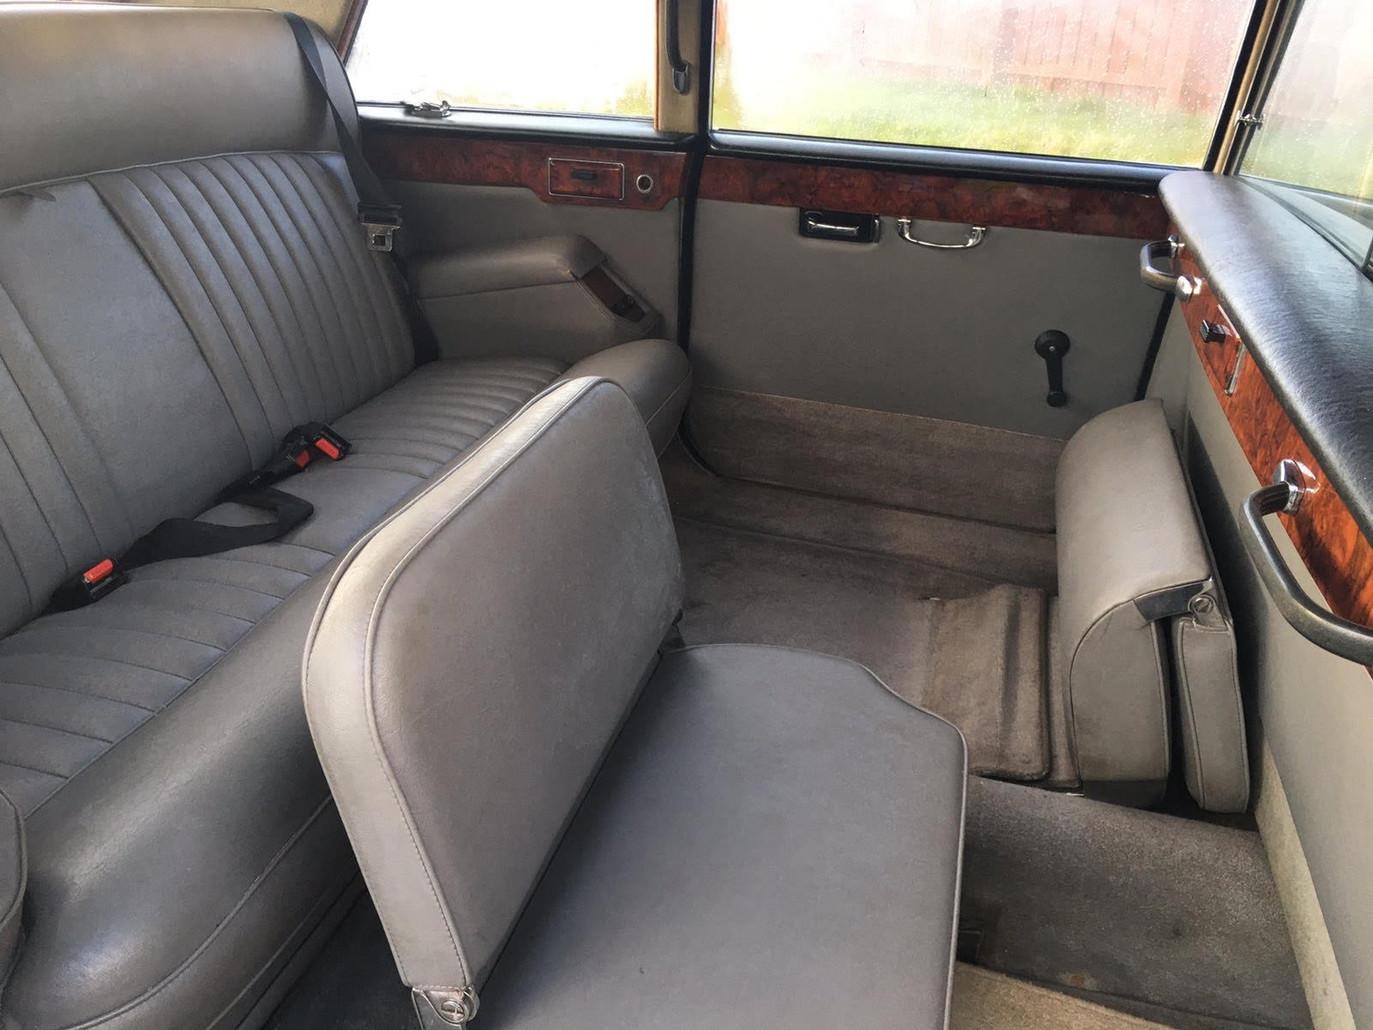 Daimler DS 420 Rear Interior.jpg